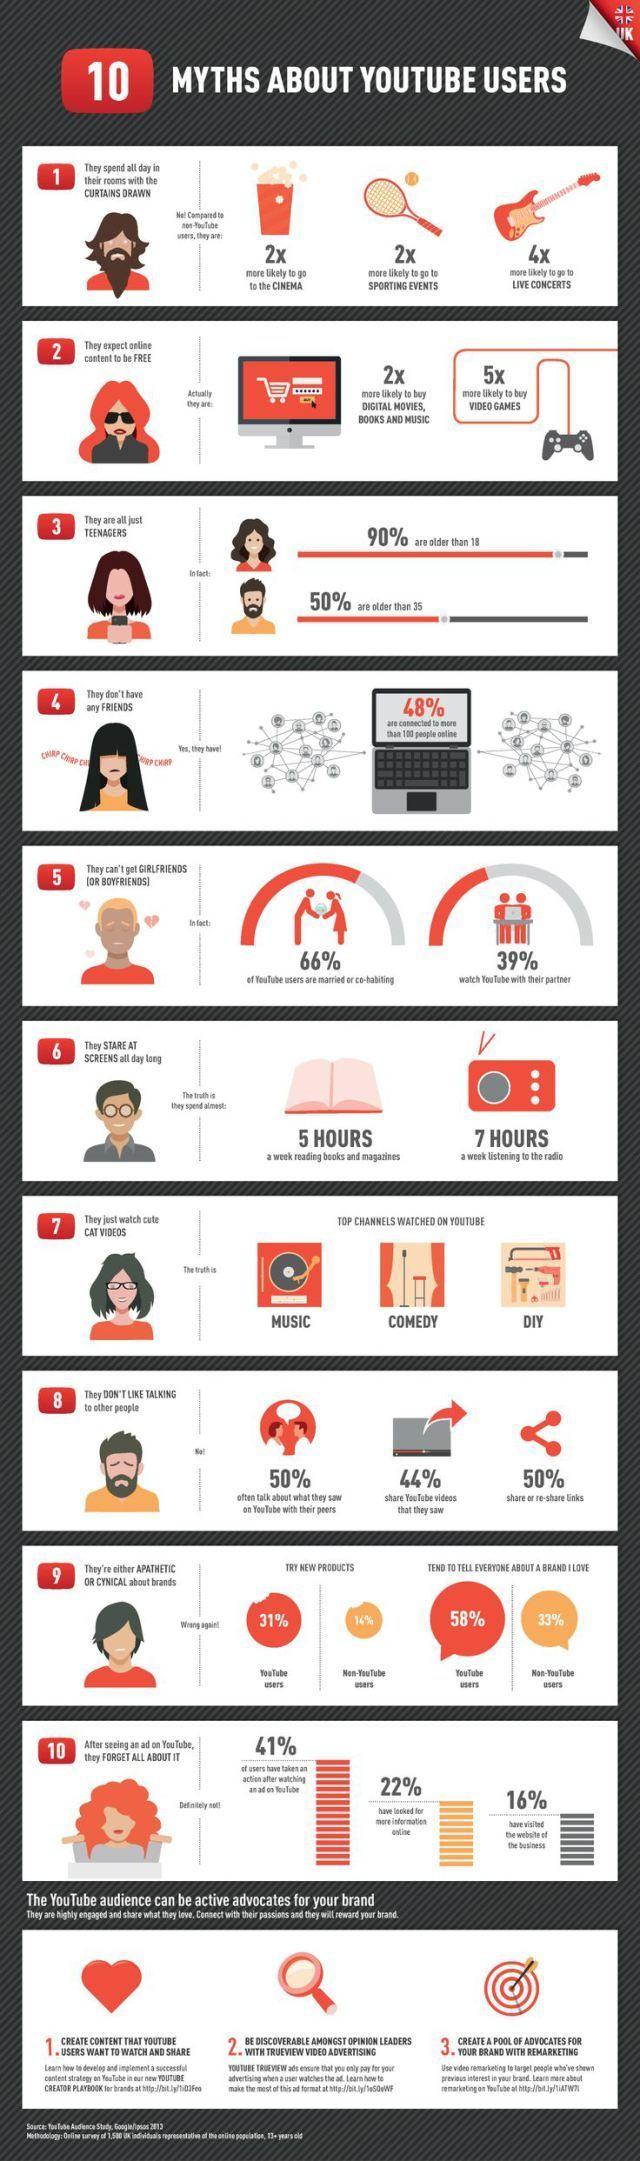 Youtube myths you need to know. #infographic #infografia #socialmedia